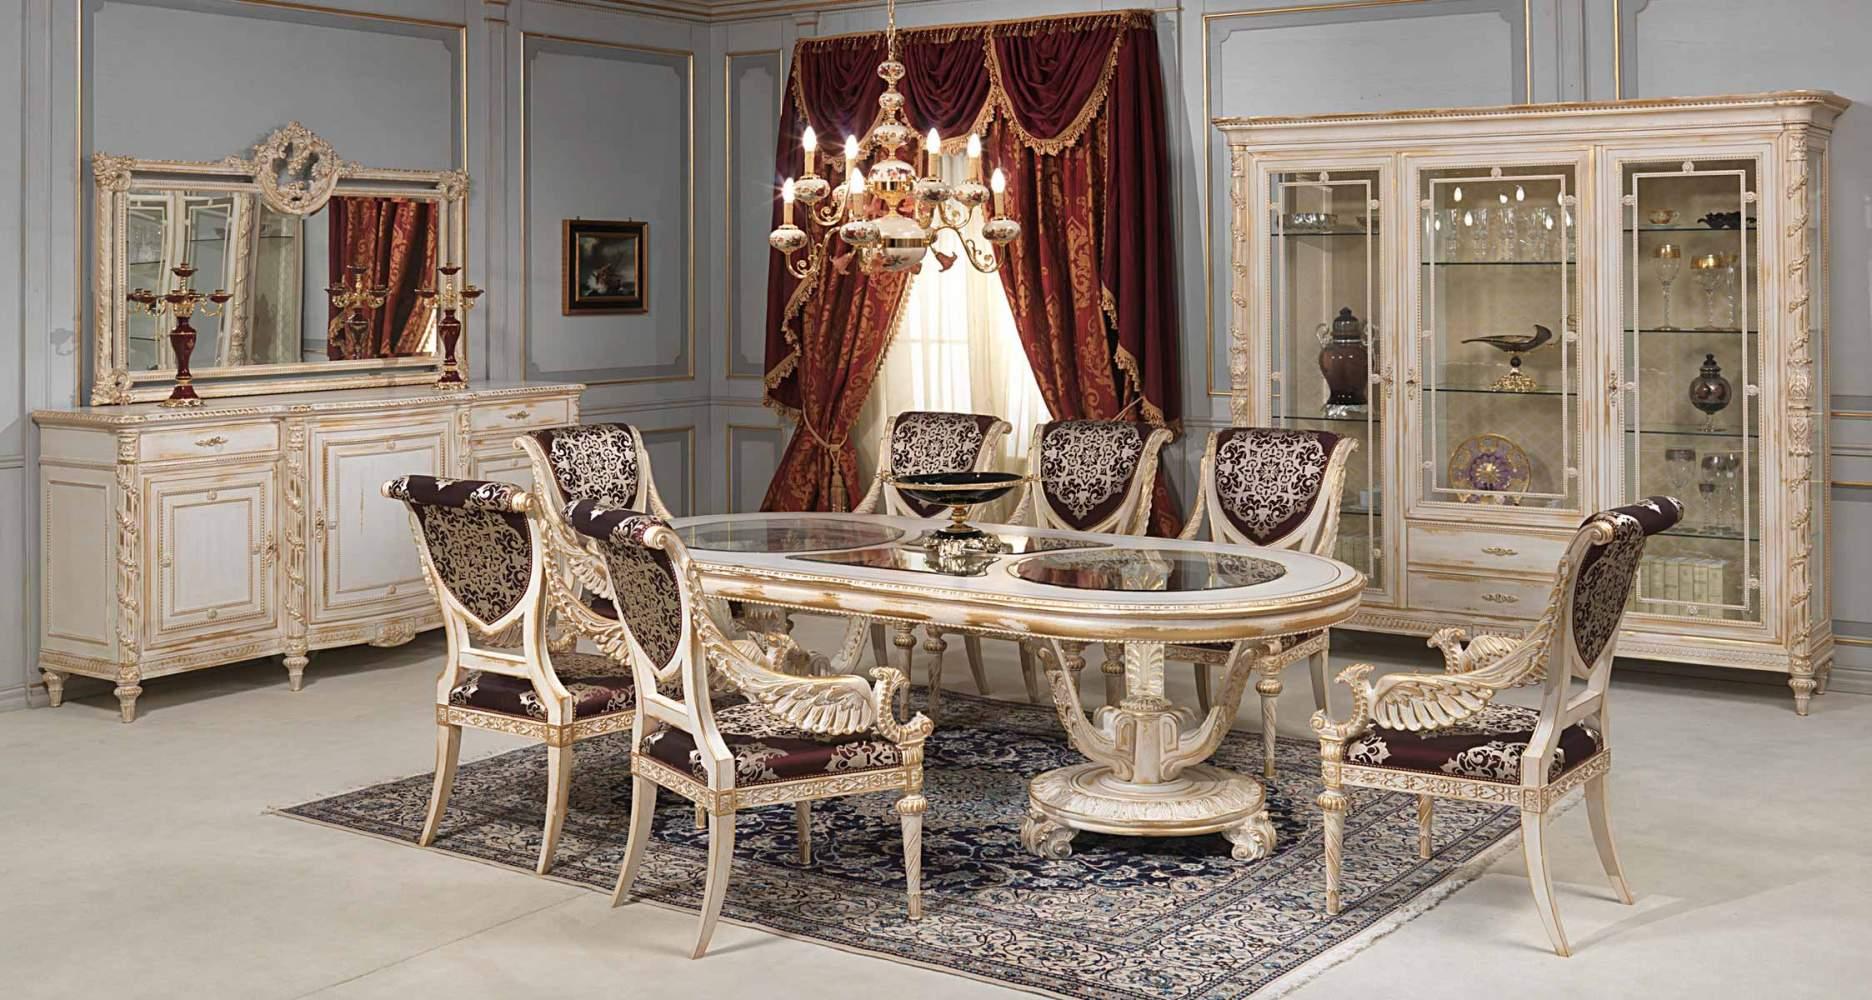 Mobili Della Sala Da Pranzo : Sala da pranzo white and gold in stile luigi xvi vimercati meda